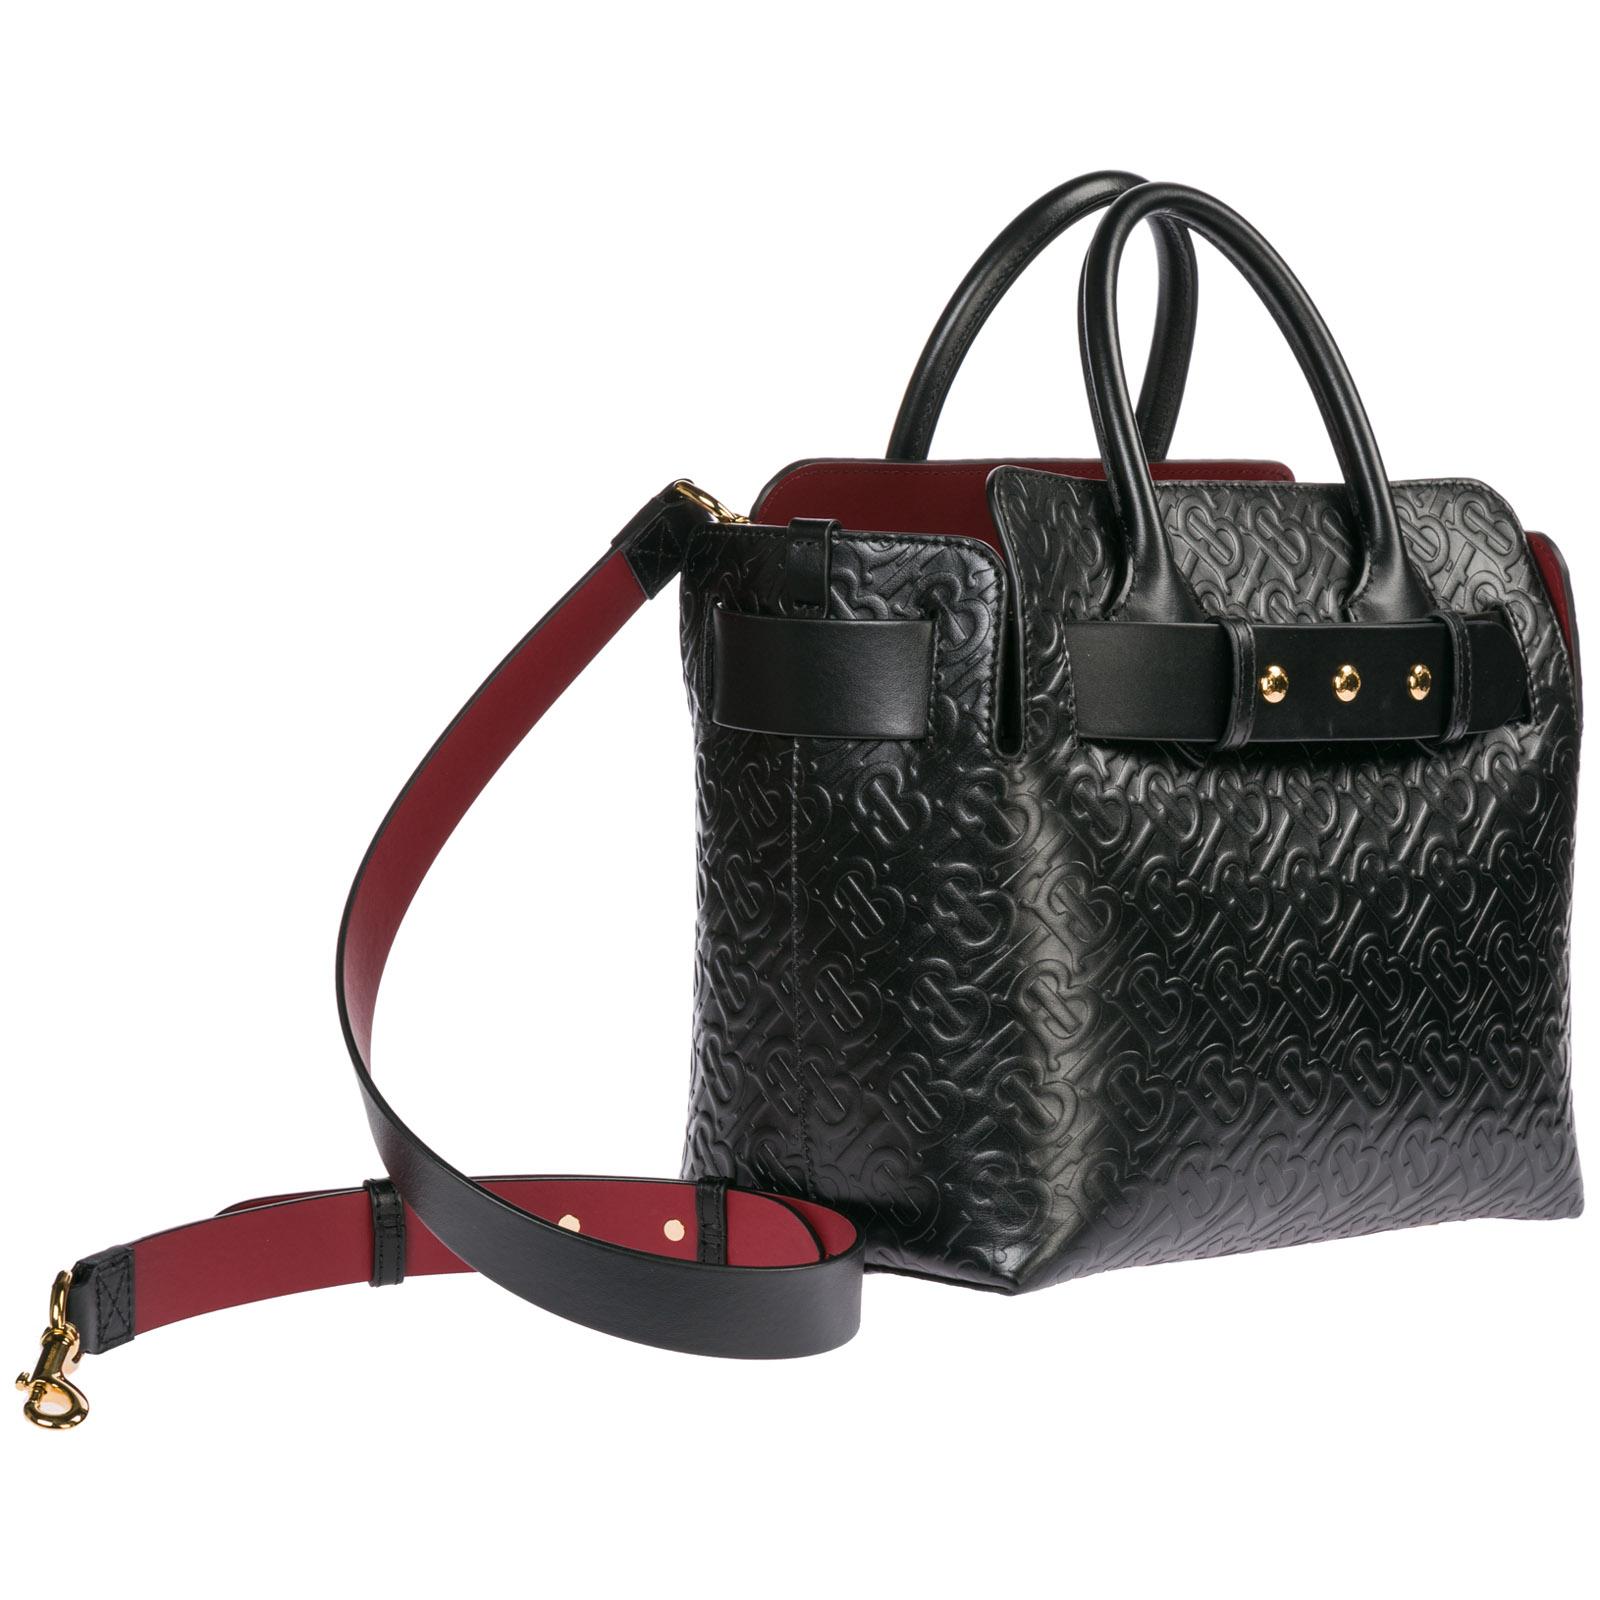 e51e104440 ... Women's leather handbag shopping bag purse the belt ...